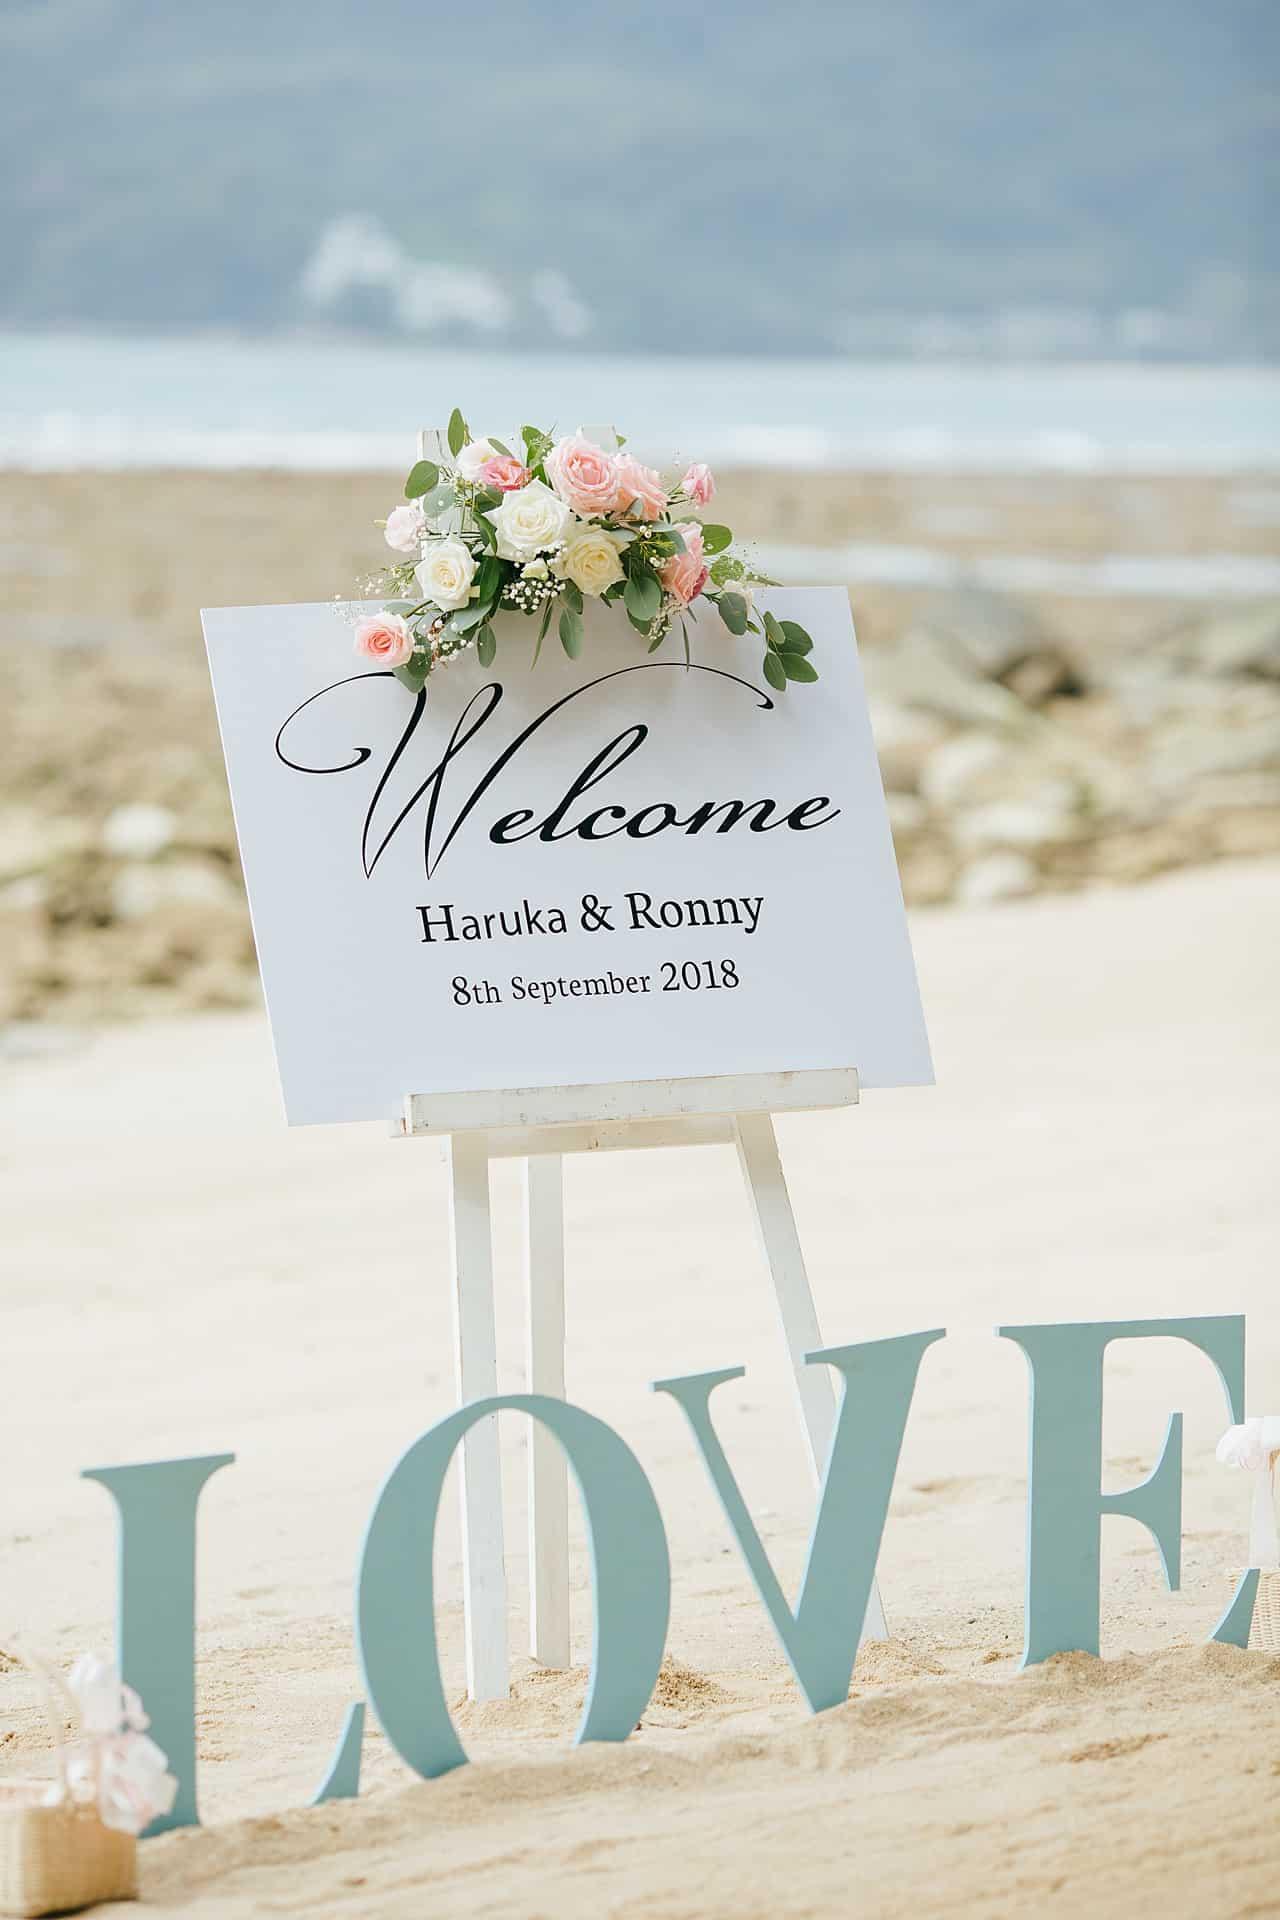 Wedding Haruka & Ronny, Hua Beach 8th September 2018 229